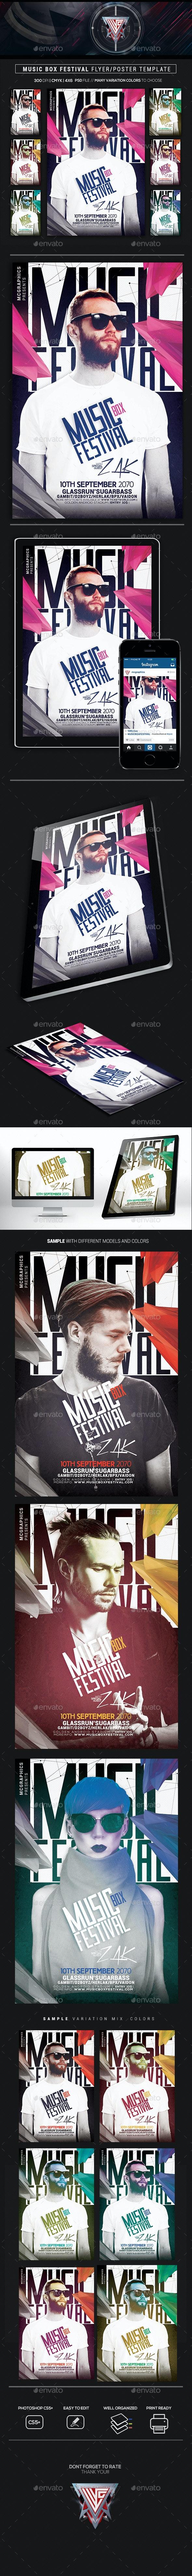 Music Box Festival DJs Flyer/Poster Template - Events Flyers